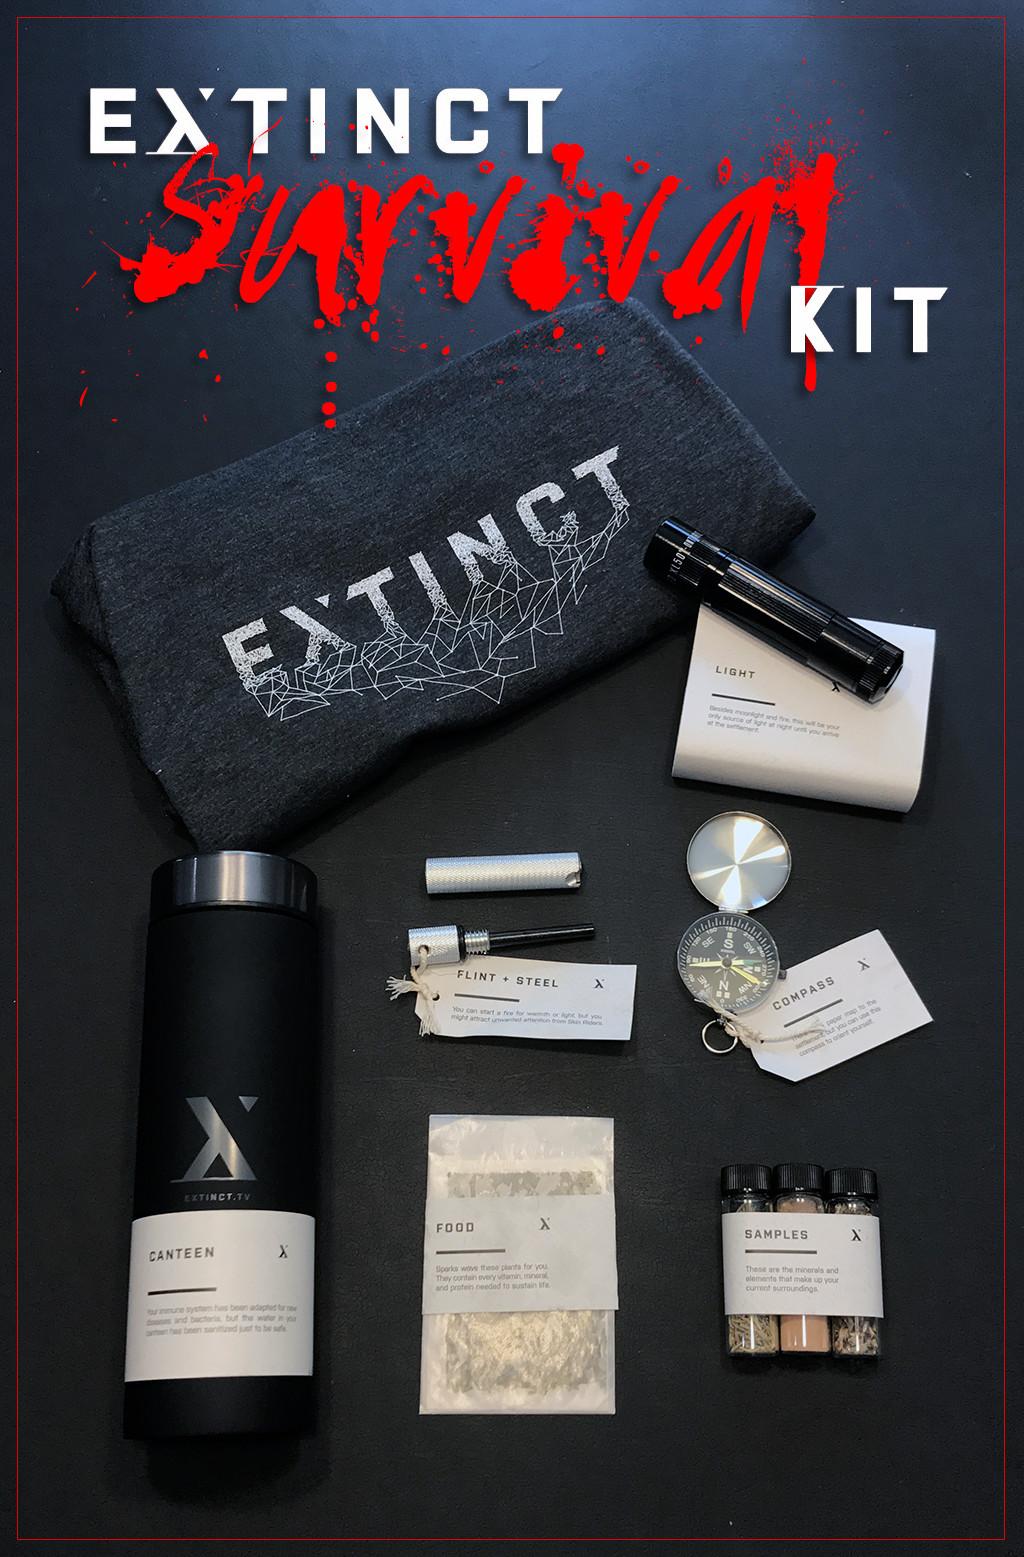 Ender's Game creator Orson Scott Card brings us Extinct scifi tv series premiering October 1st on BYUtv. Would you survive? - SahmReviews.com